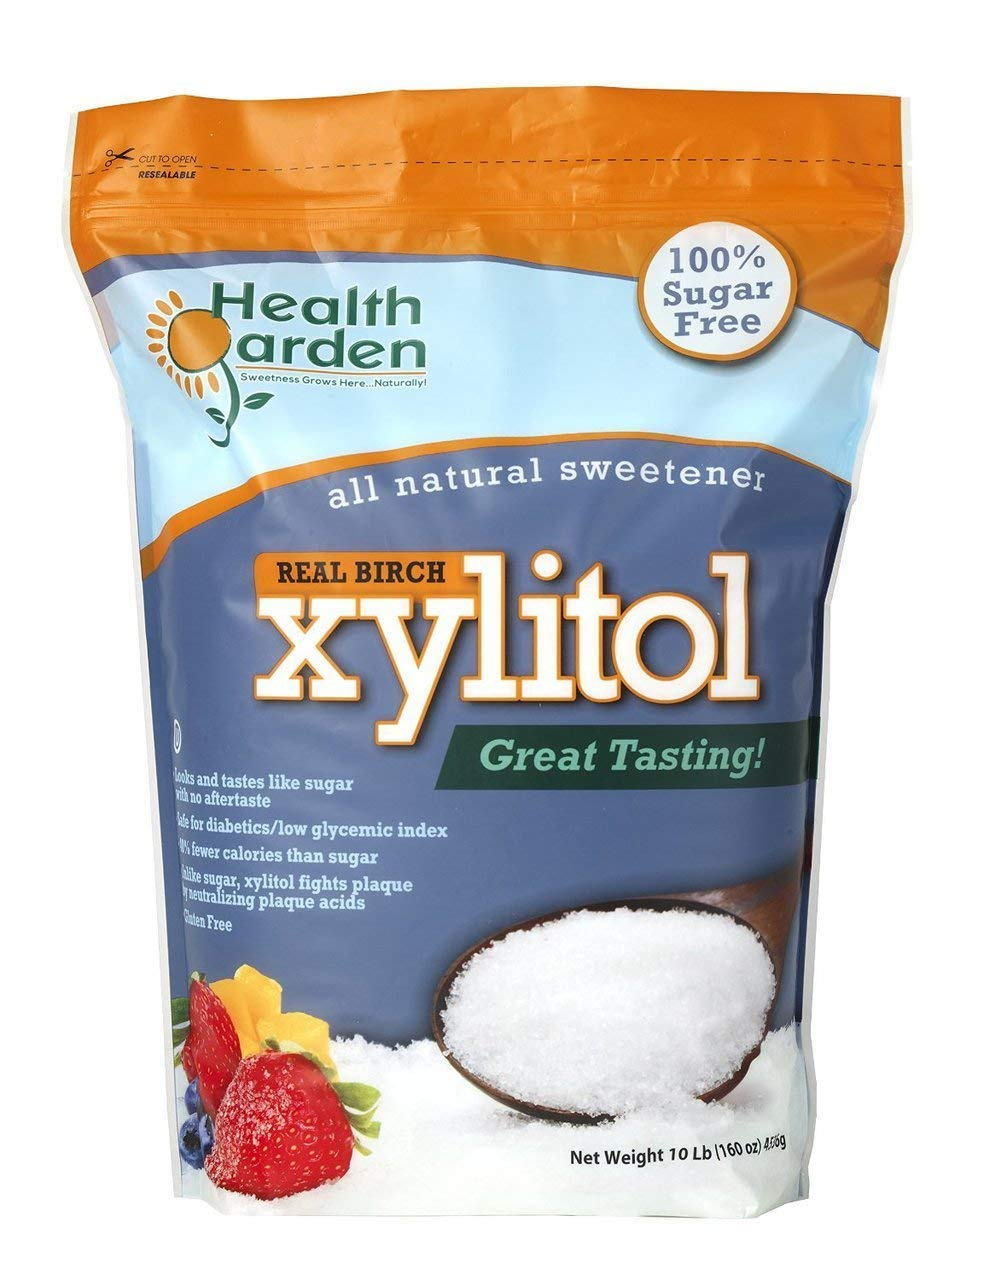 Health Garden Birch Xylitol Sugar Free Sweetener, All Natural, Non GMO (Not from Corn (10 LB) by HEALTH GARDEN